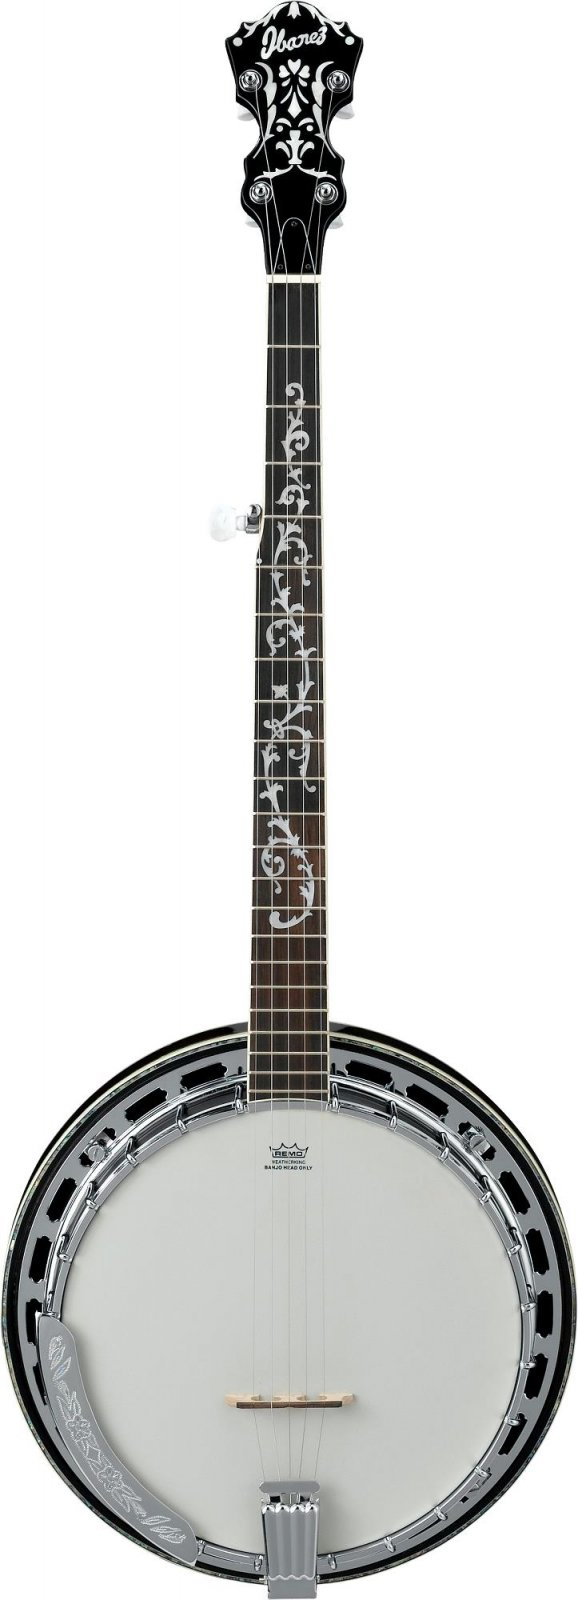 Ibanez B300 5 String Closed Back/Resonator Banjo